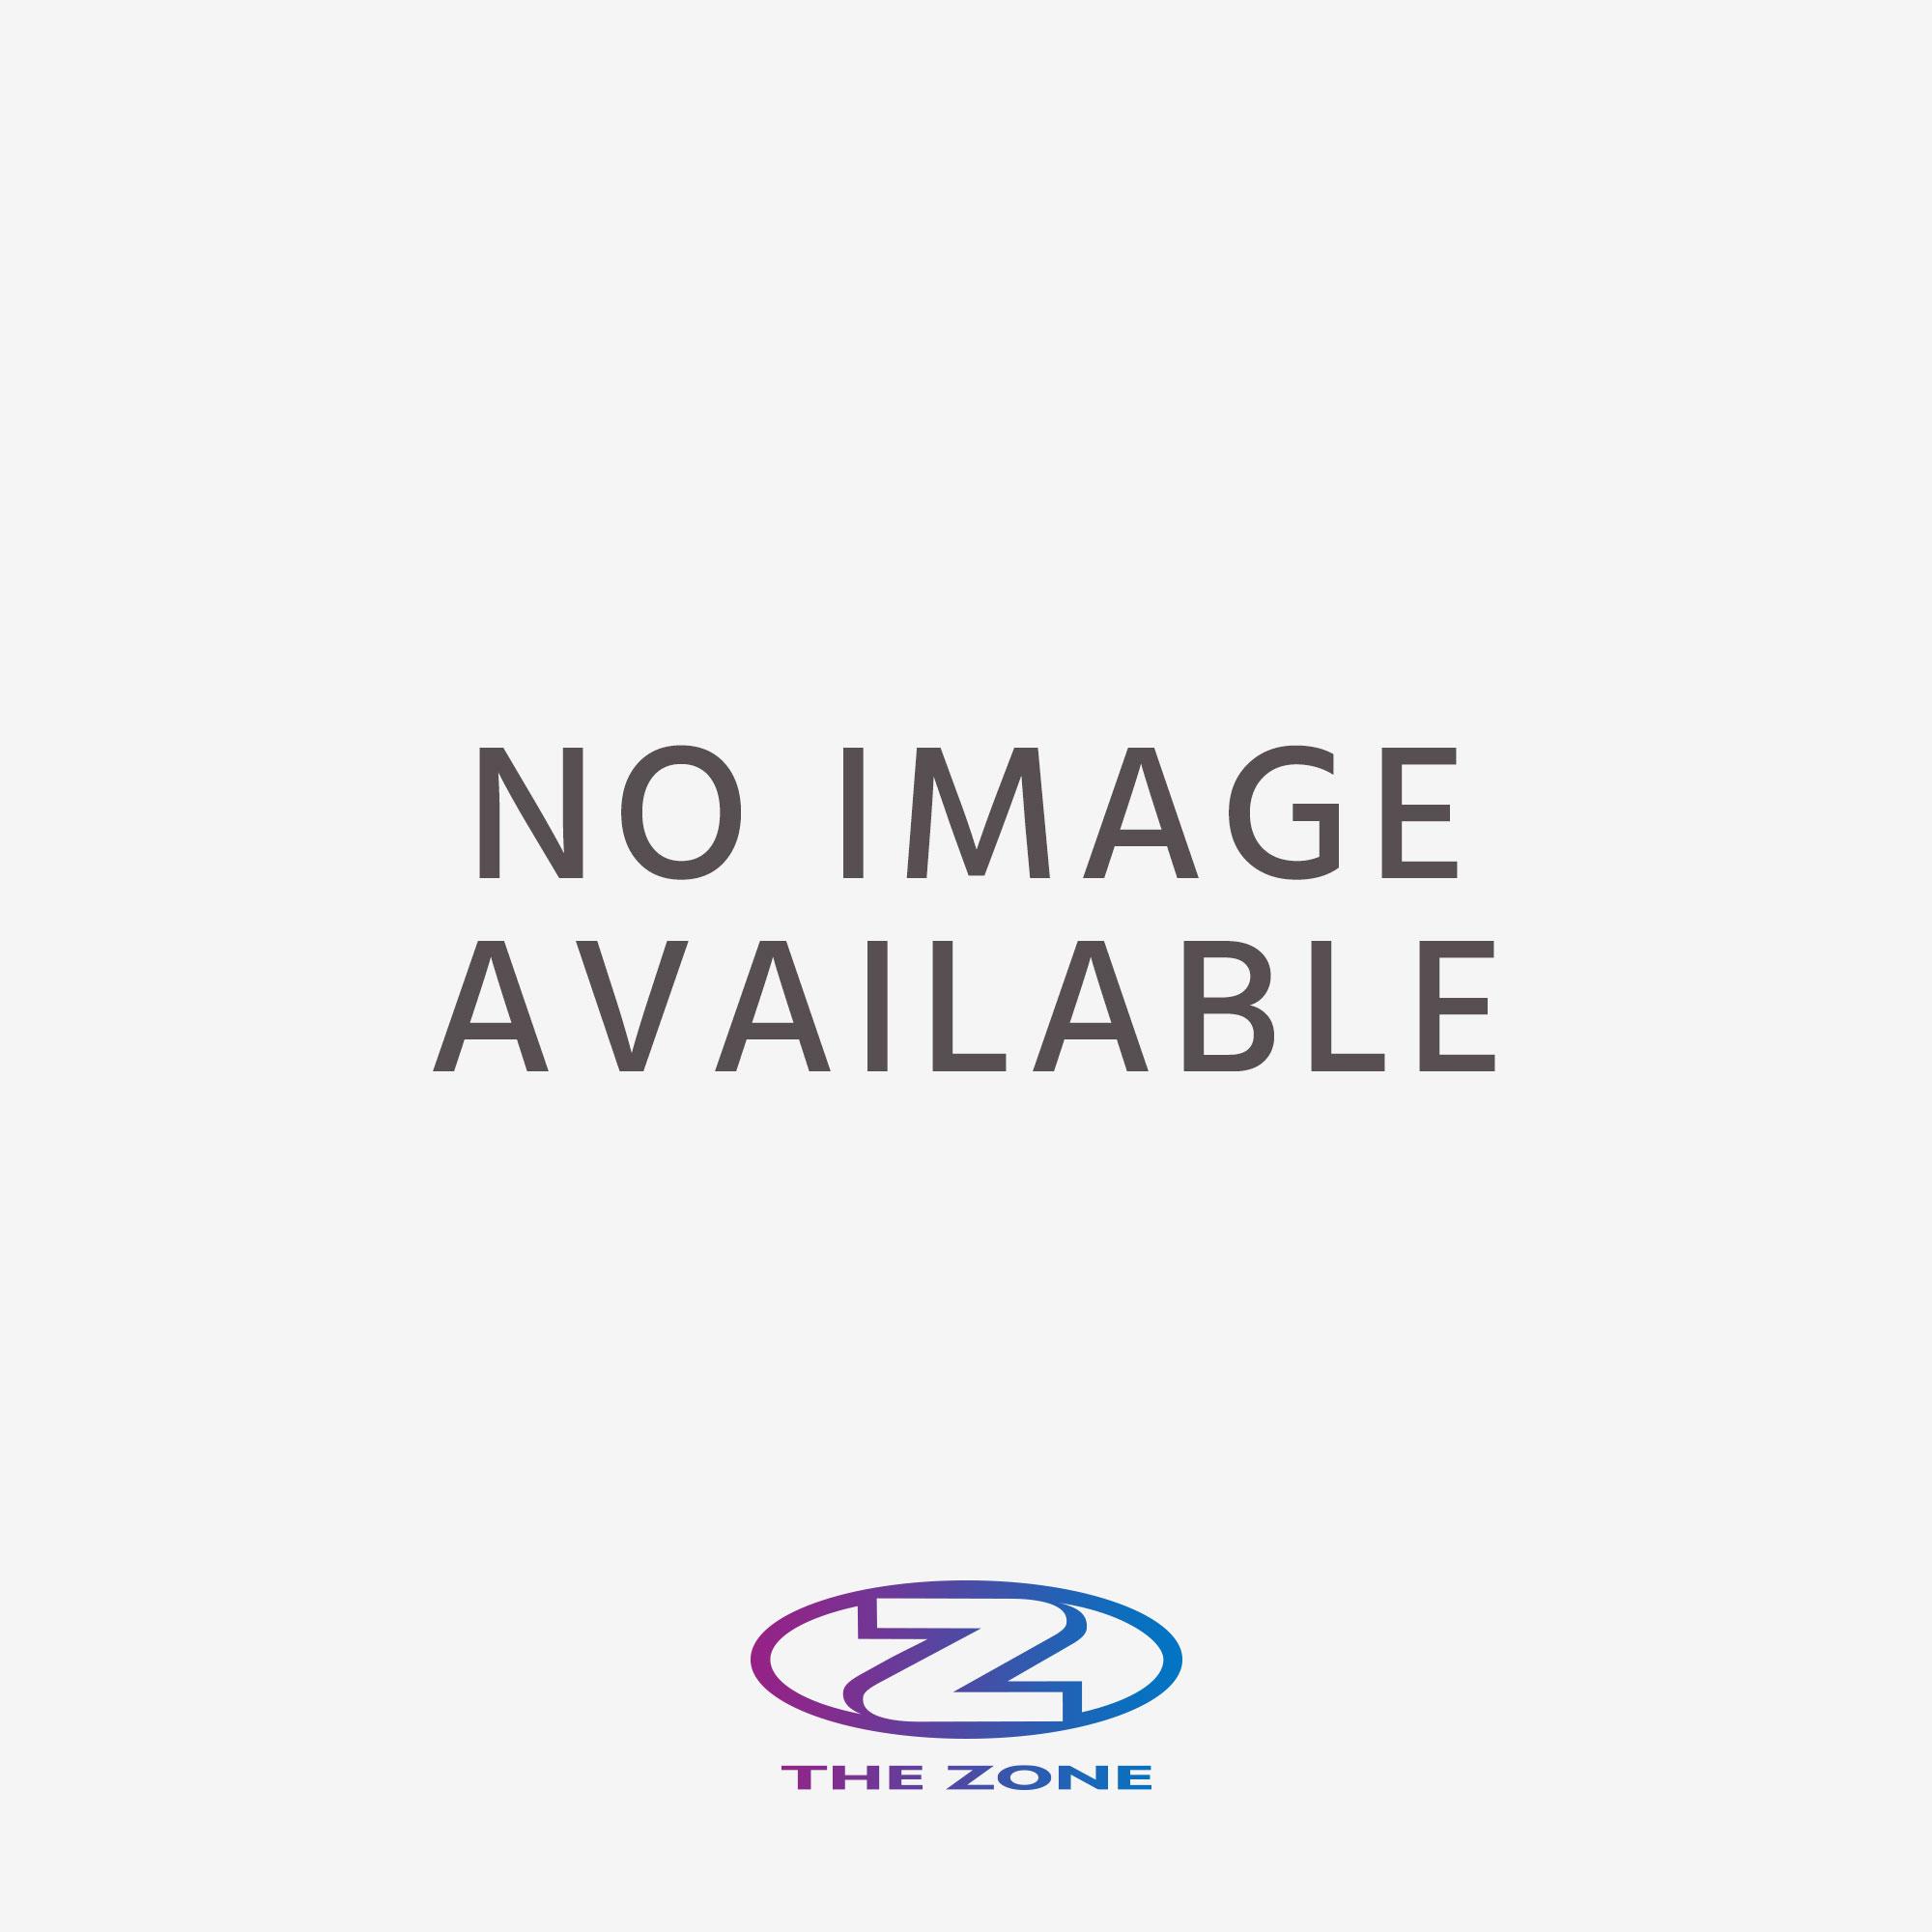 b99ce9575ae6 Drawstring Gymnastics Bag